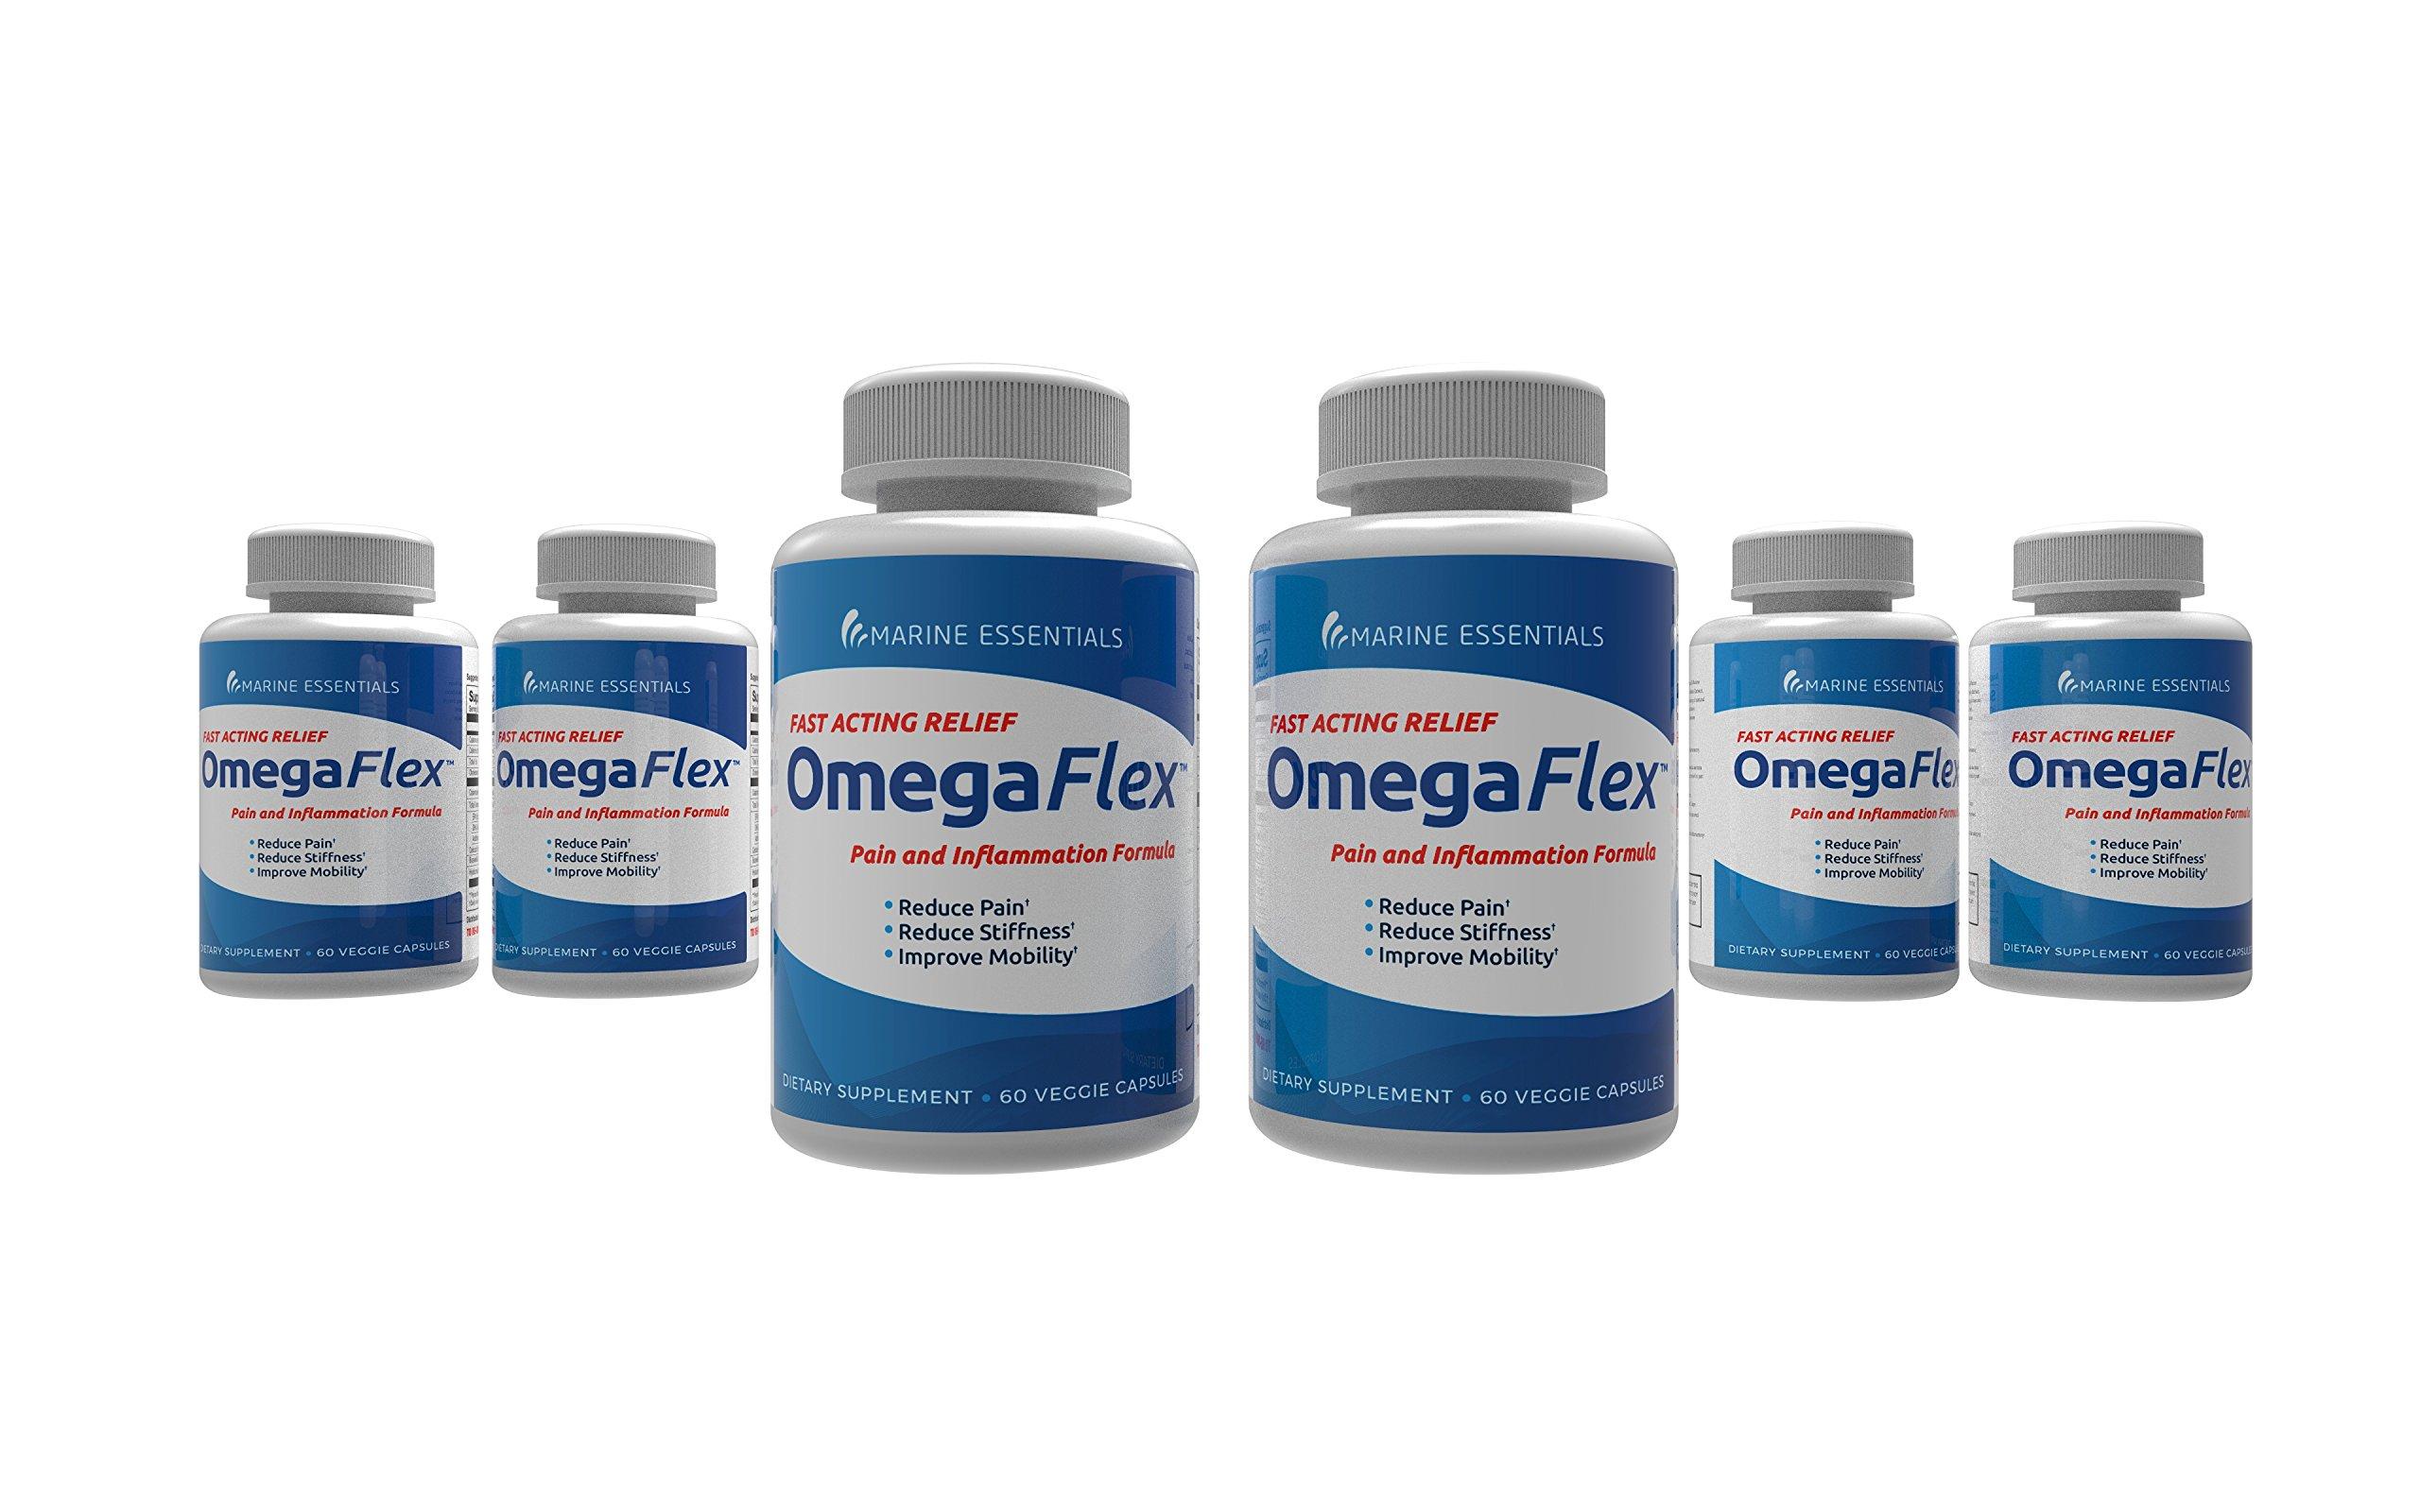 Omega Flex: Reduce Pain, Inflammation, Lubricate Joints, Help Increase Blood Flow, Lessen Stiffness in 7 Days (6 Bottles) by Marine Essentials